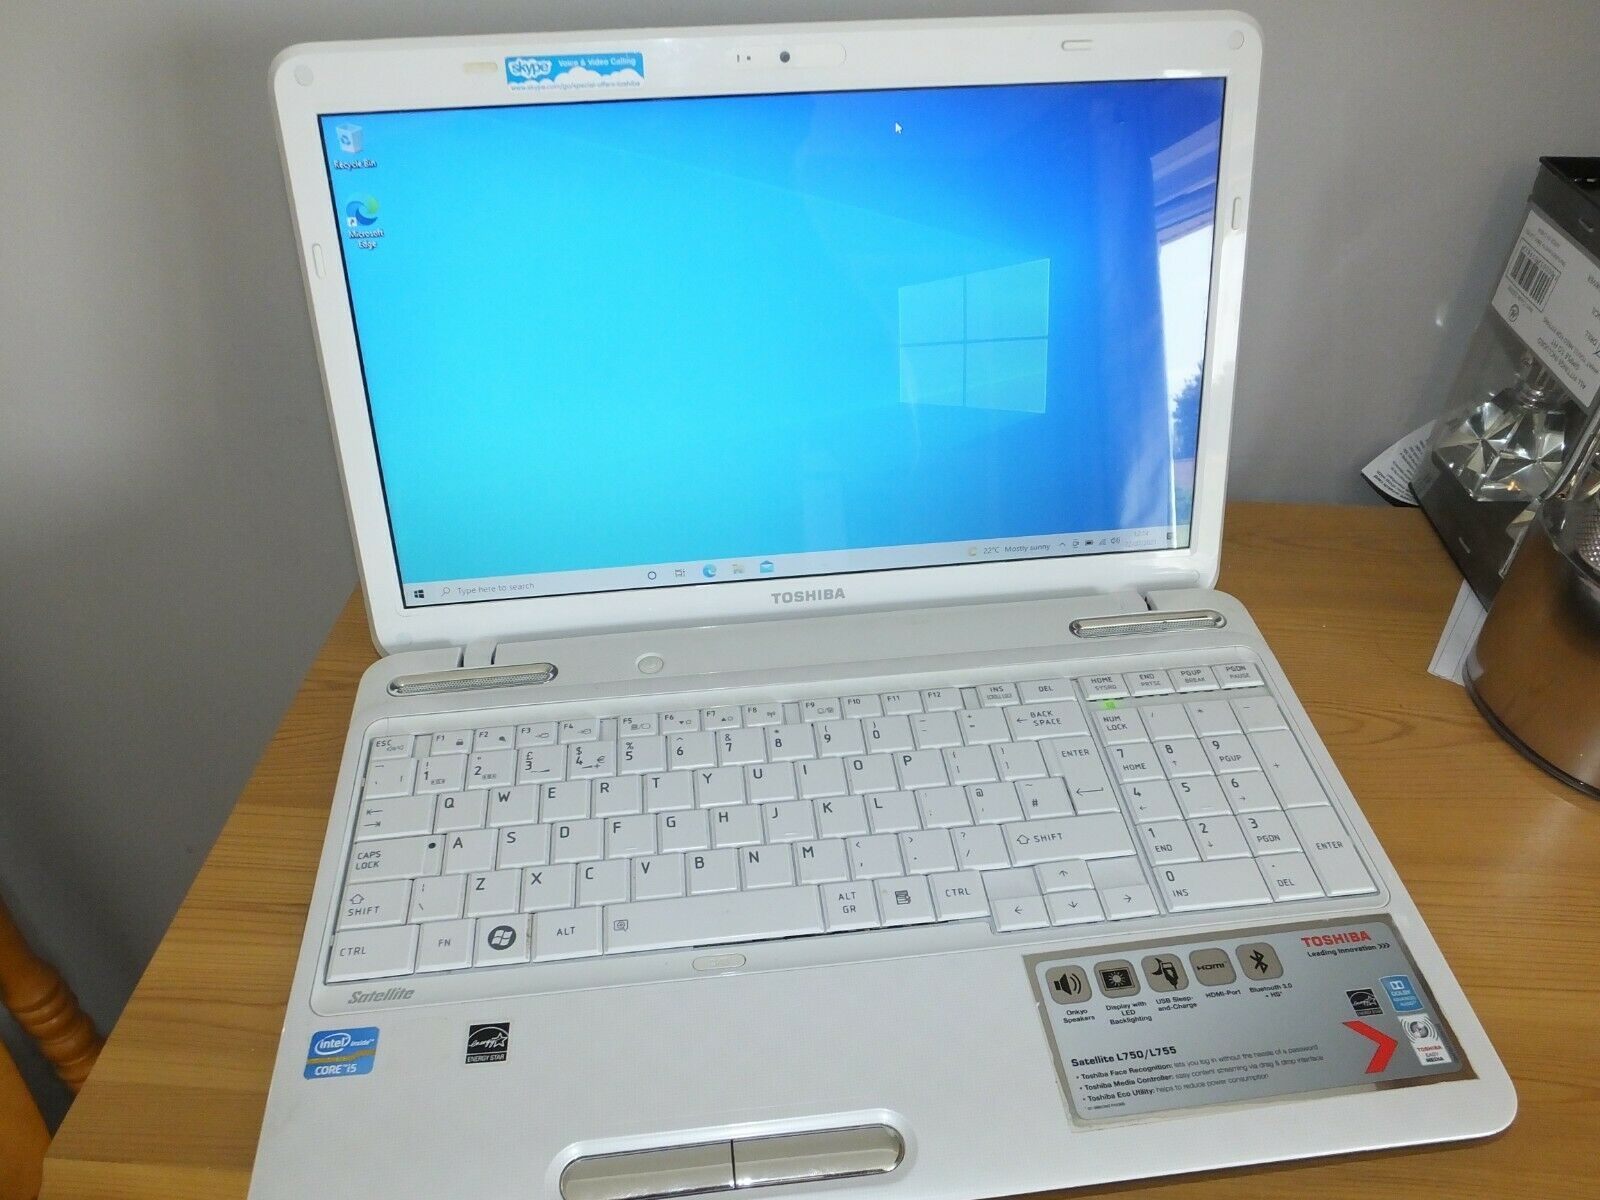 "Laptop Windows - Core i5 Toshiba l755-1np Laptop 8gb ram 1tb hd windows 10 15.6"" white hdmi wifi"